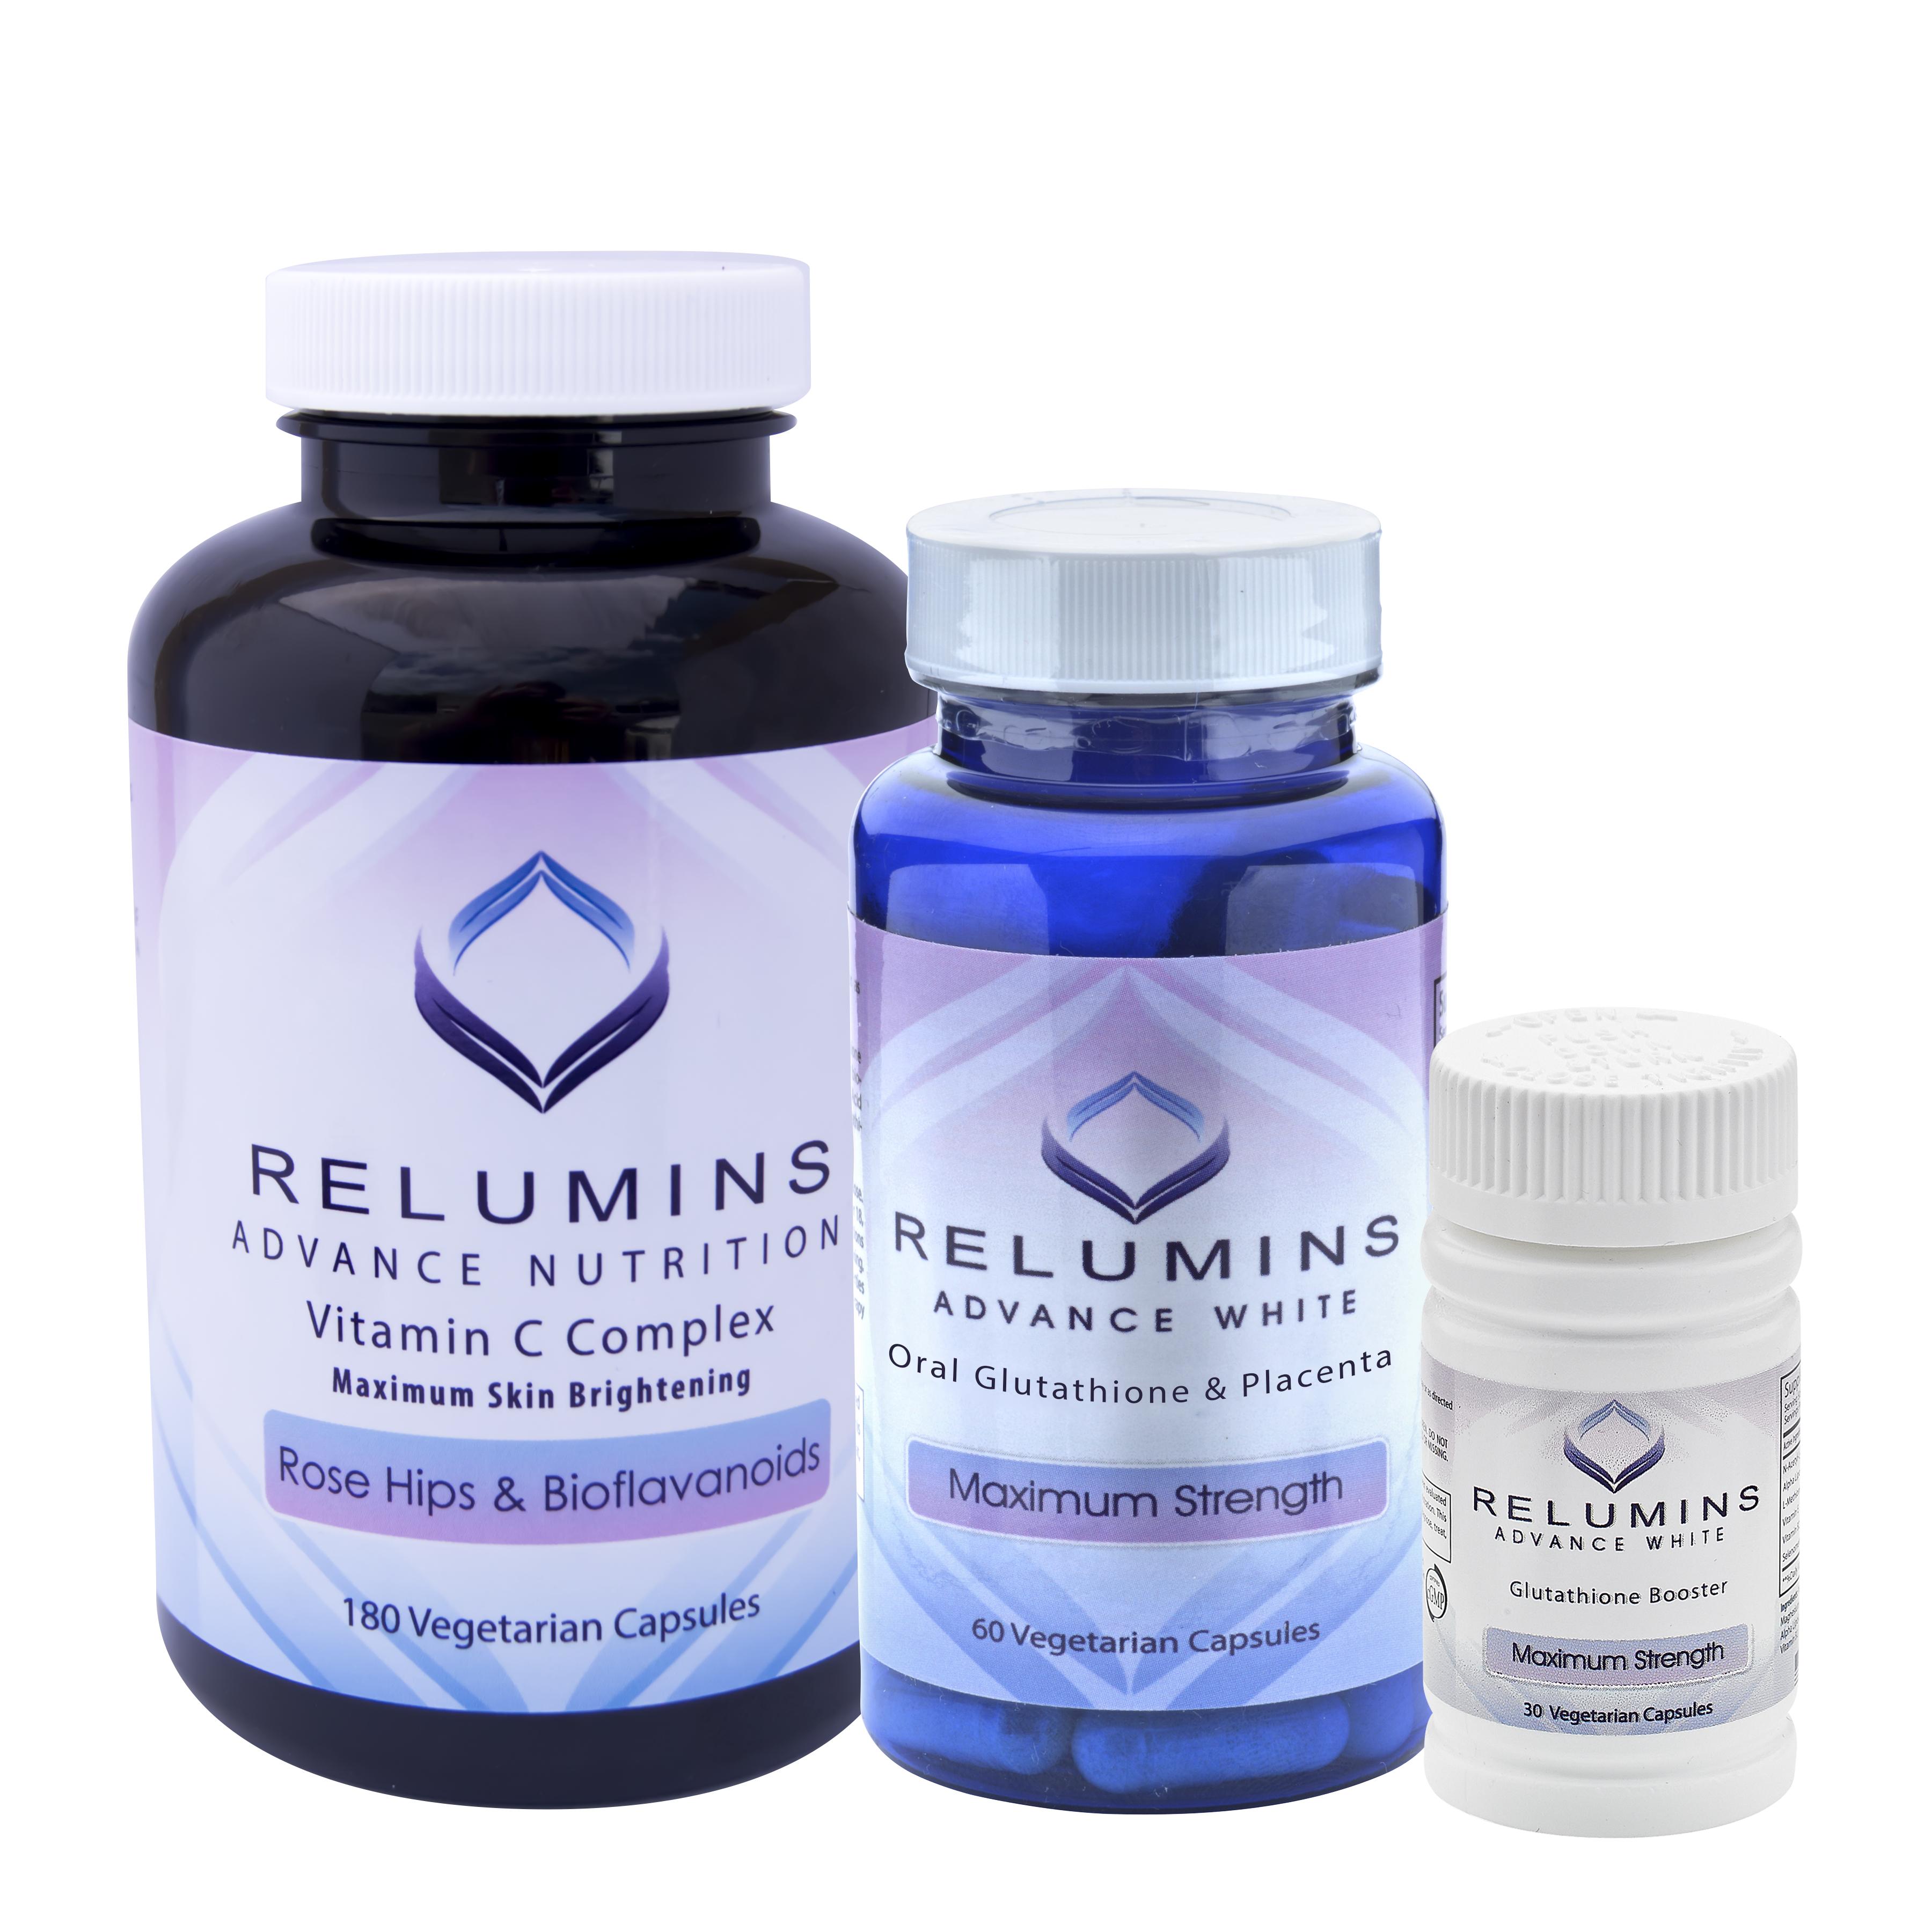 Relumins Advanced White Oral Glutathione Vitamin C Max Booster Vit Collagen Capsules Ultimate Whitening Set